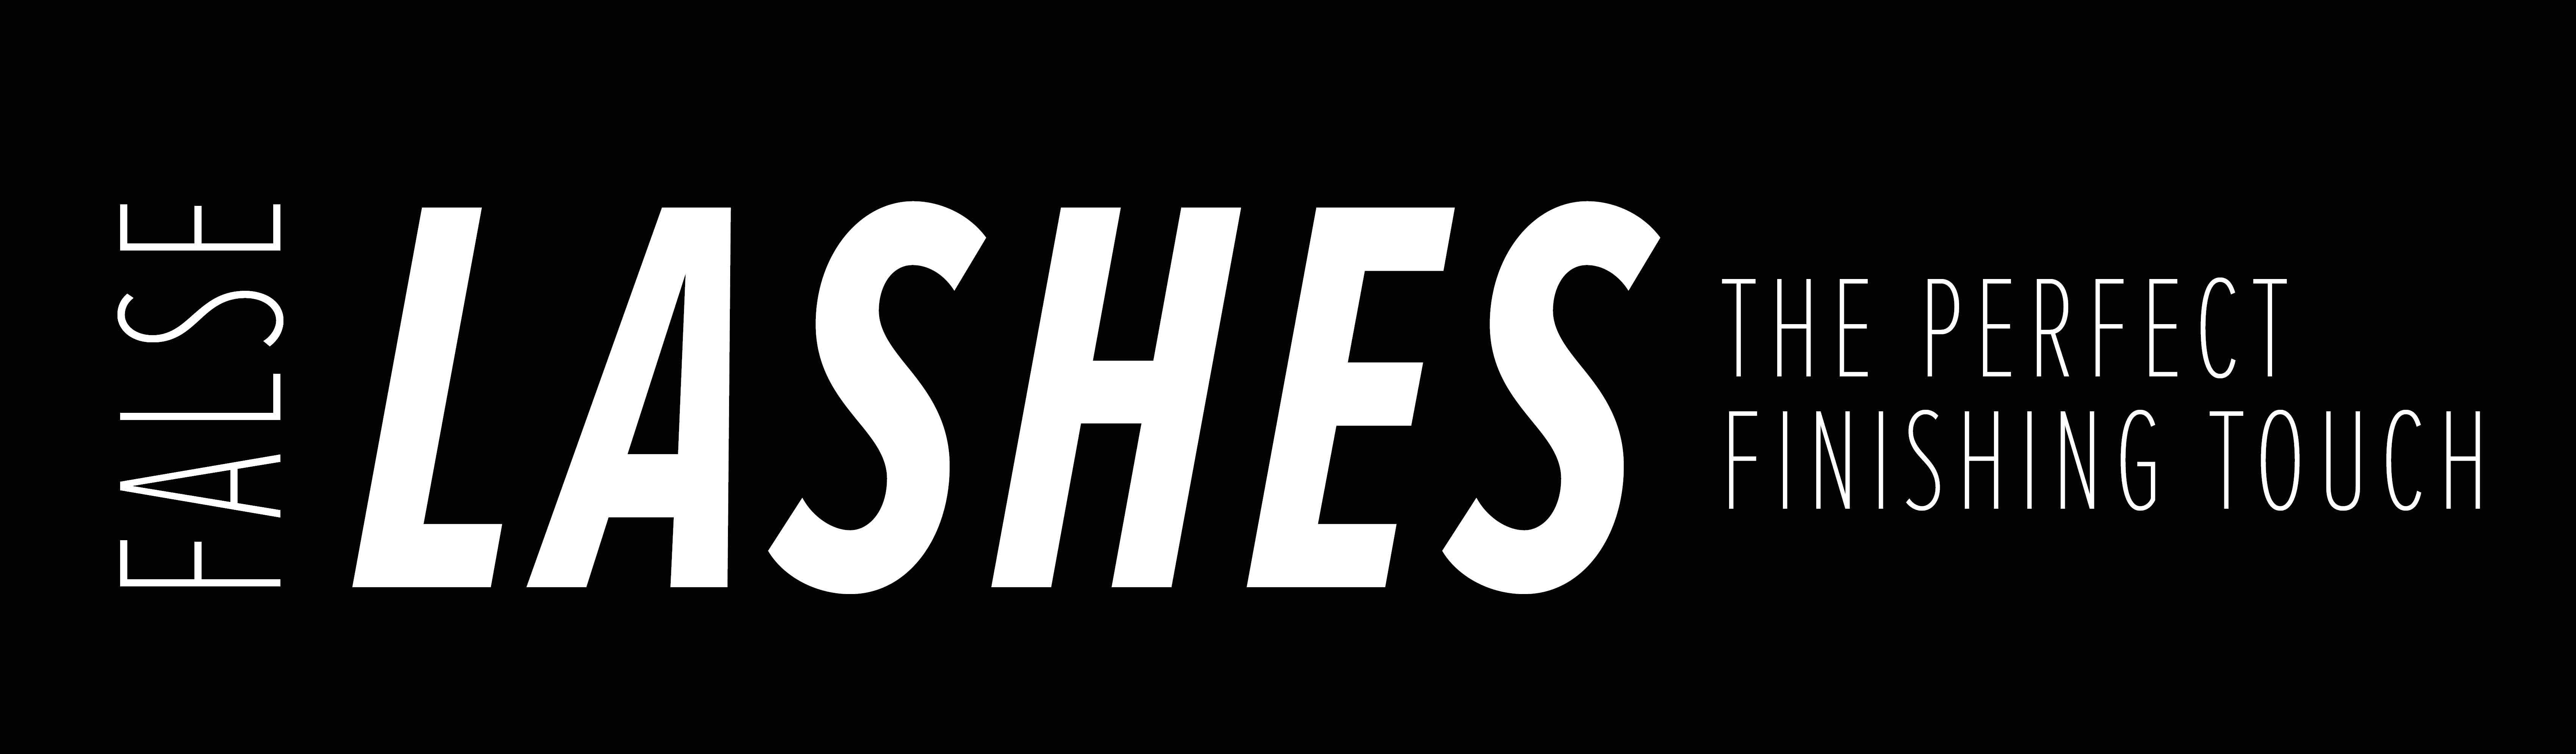 ABH-FALSE-LASHES-Lockup